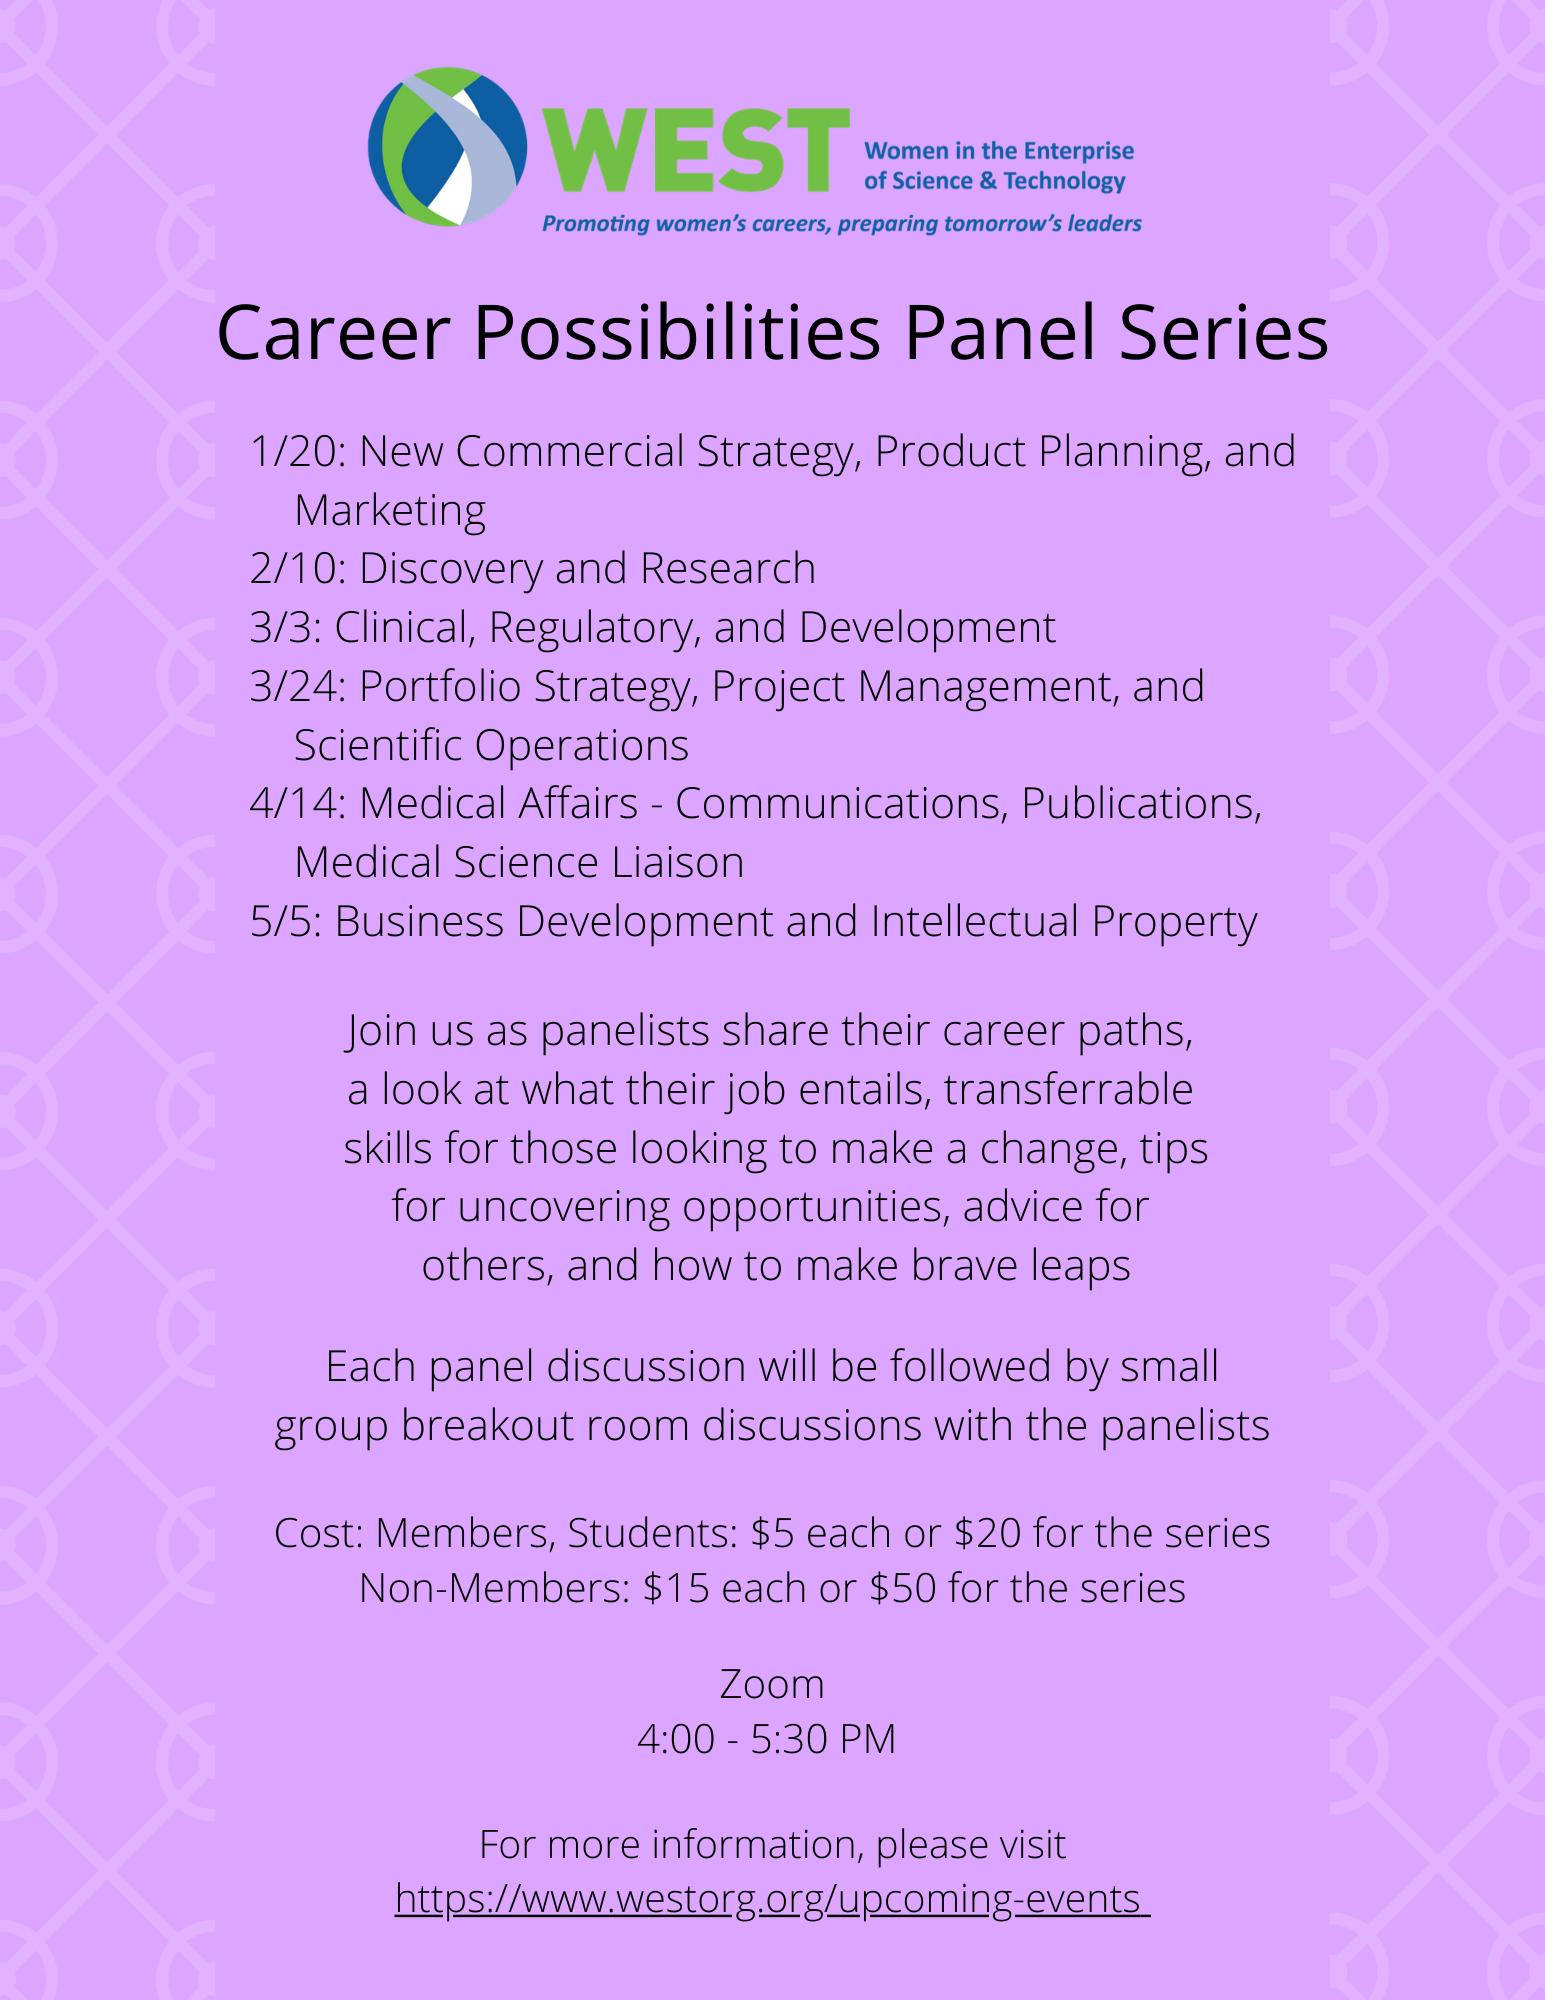 2020 Career Possibilities Panel Series